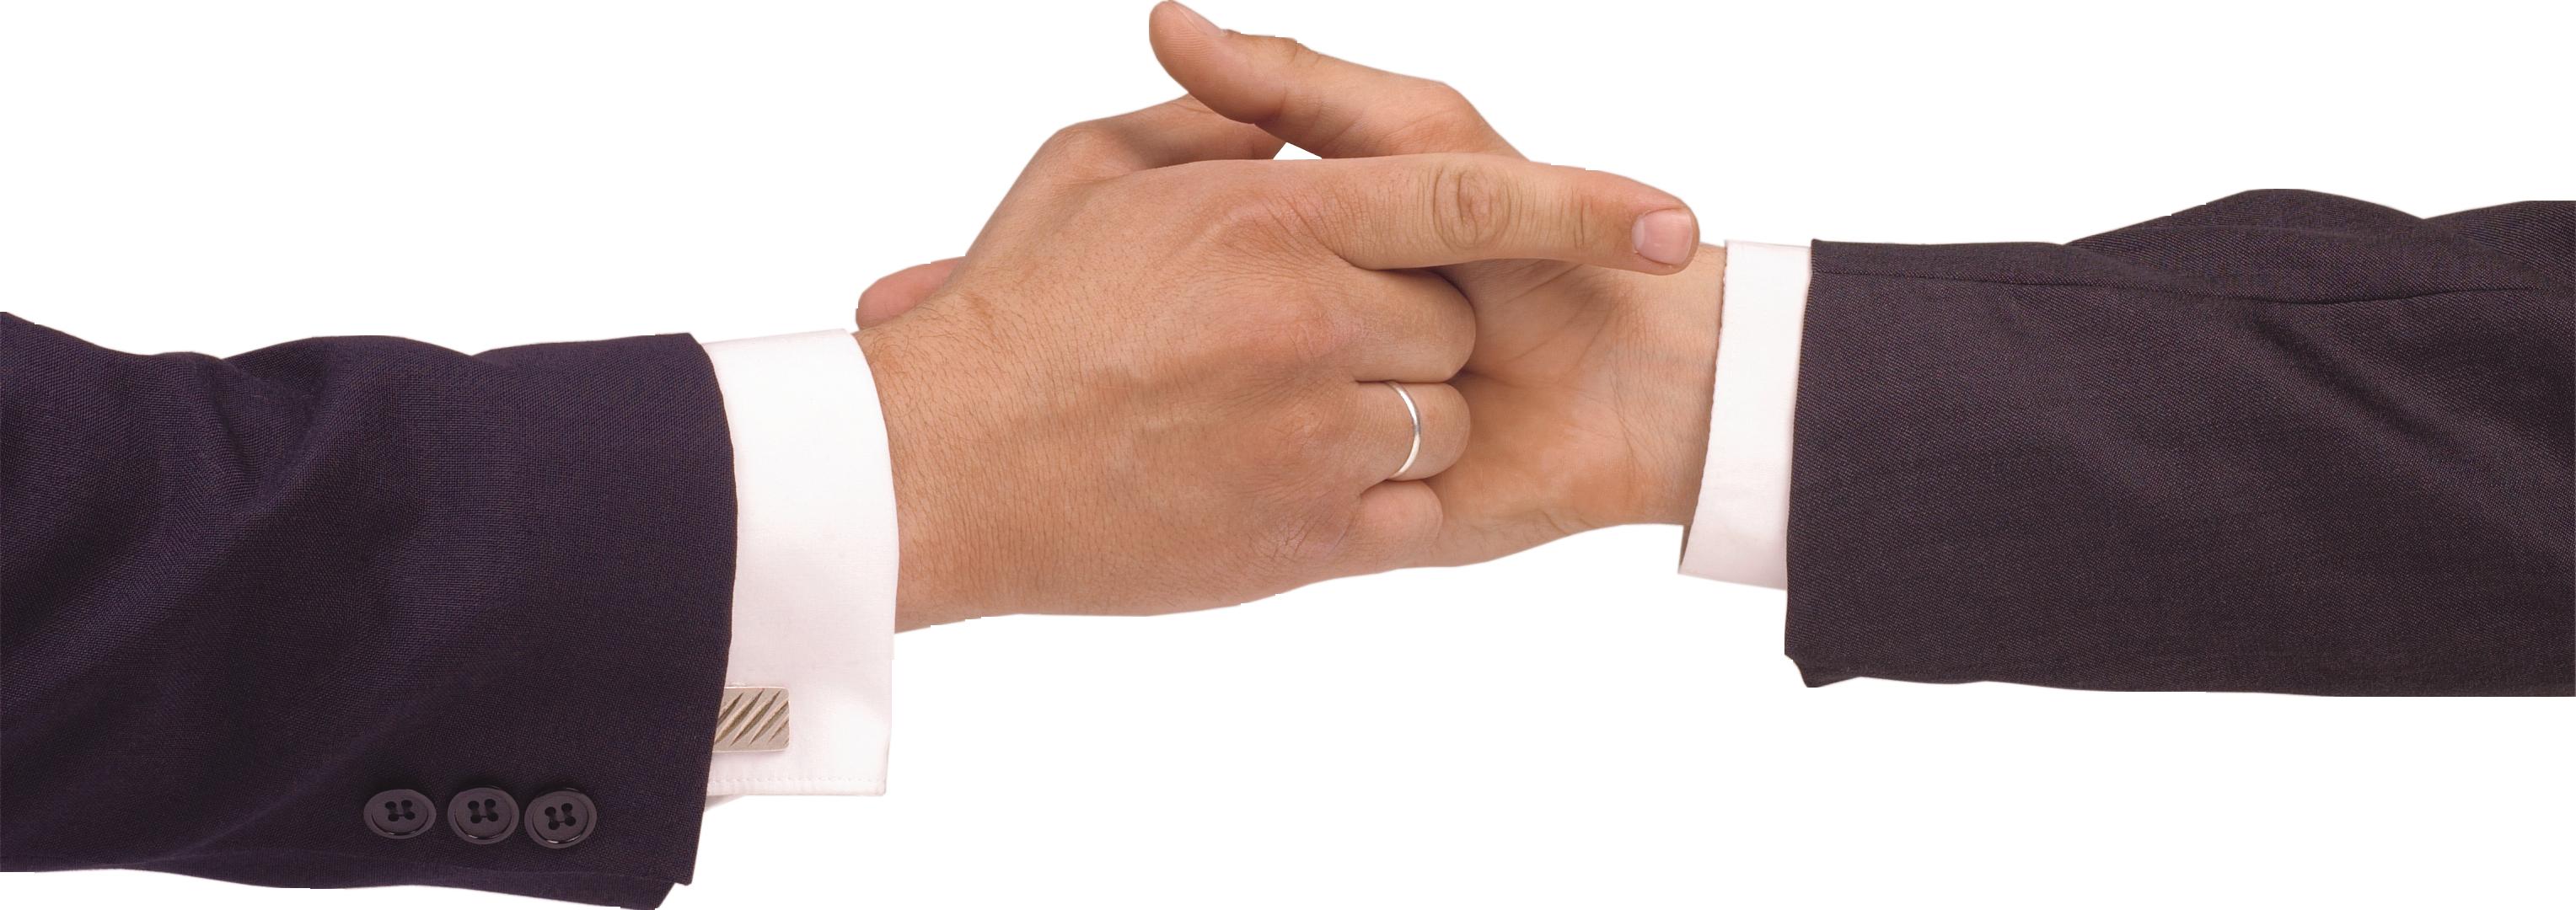 Рукопожатие PNG фото